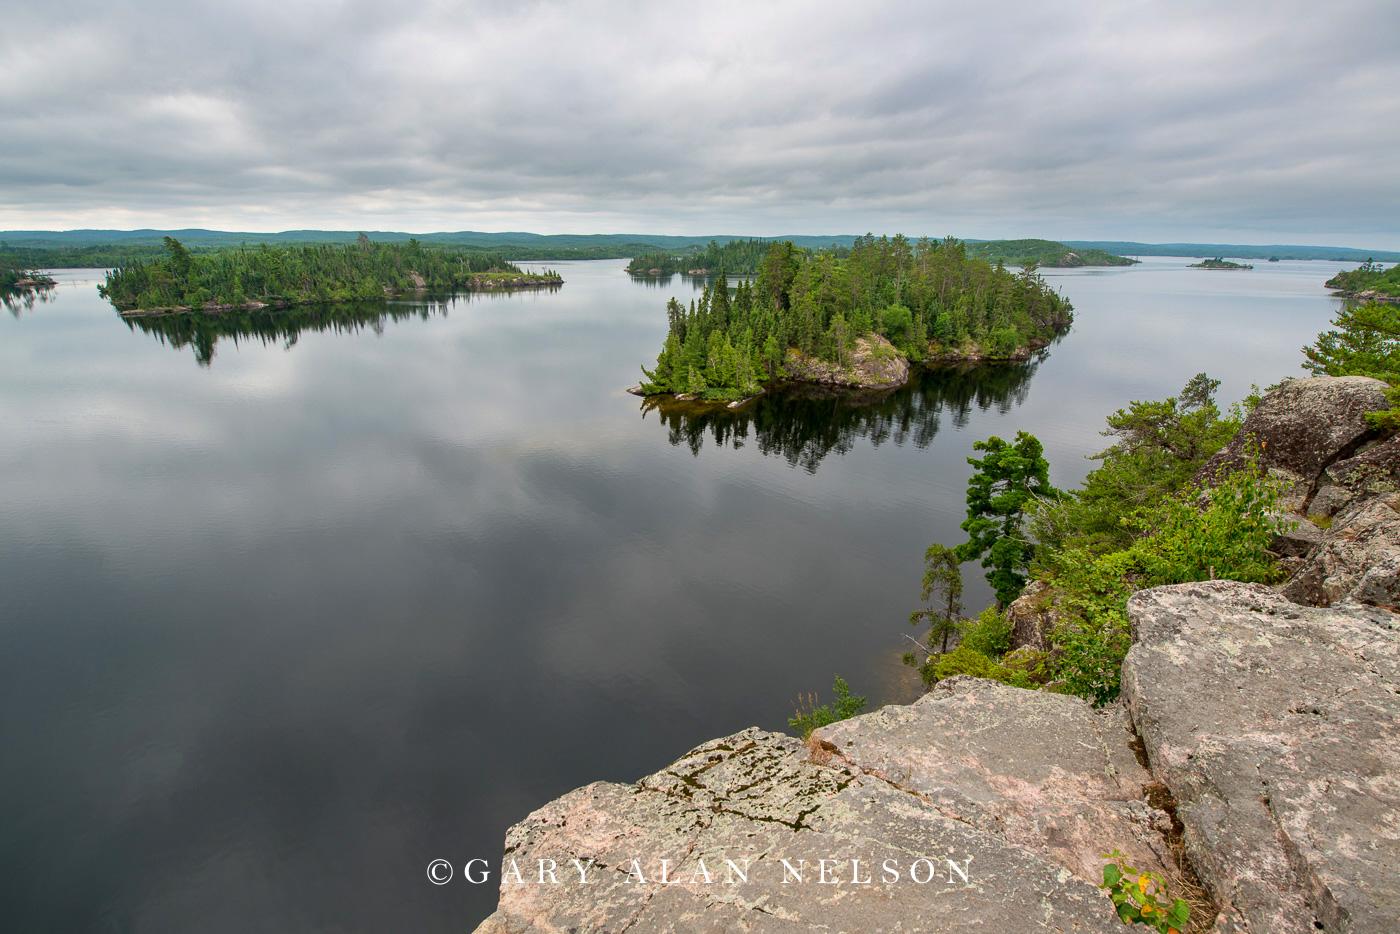 Cliffs overlooking Seagull Lake, Boundary Waters Canoe Area Wilderness, Minnesota/Canada